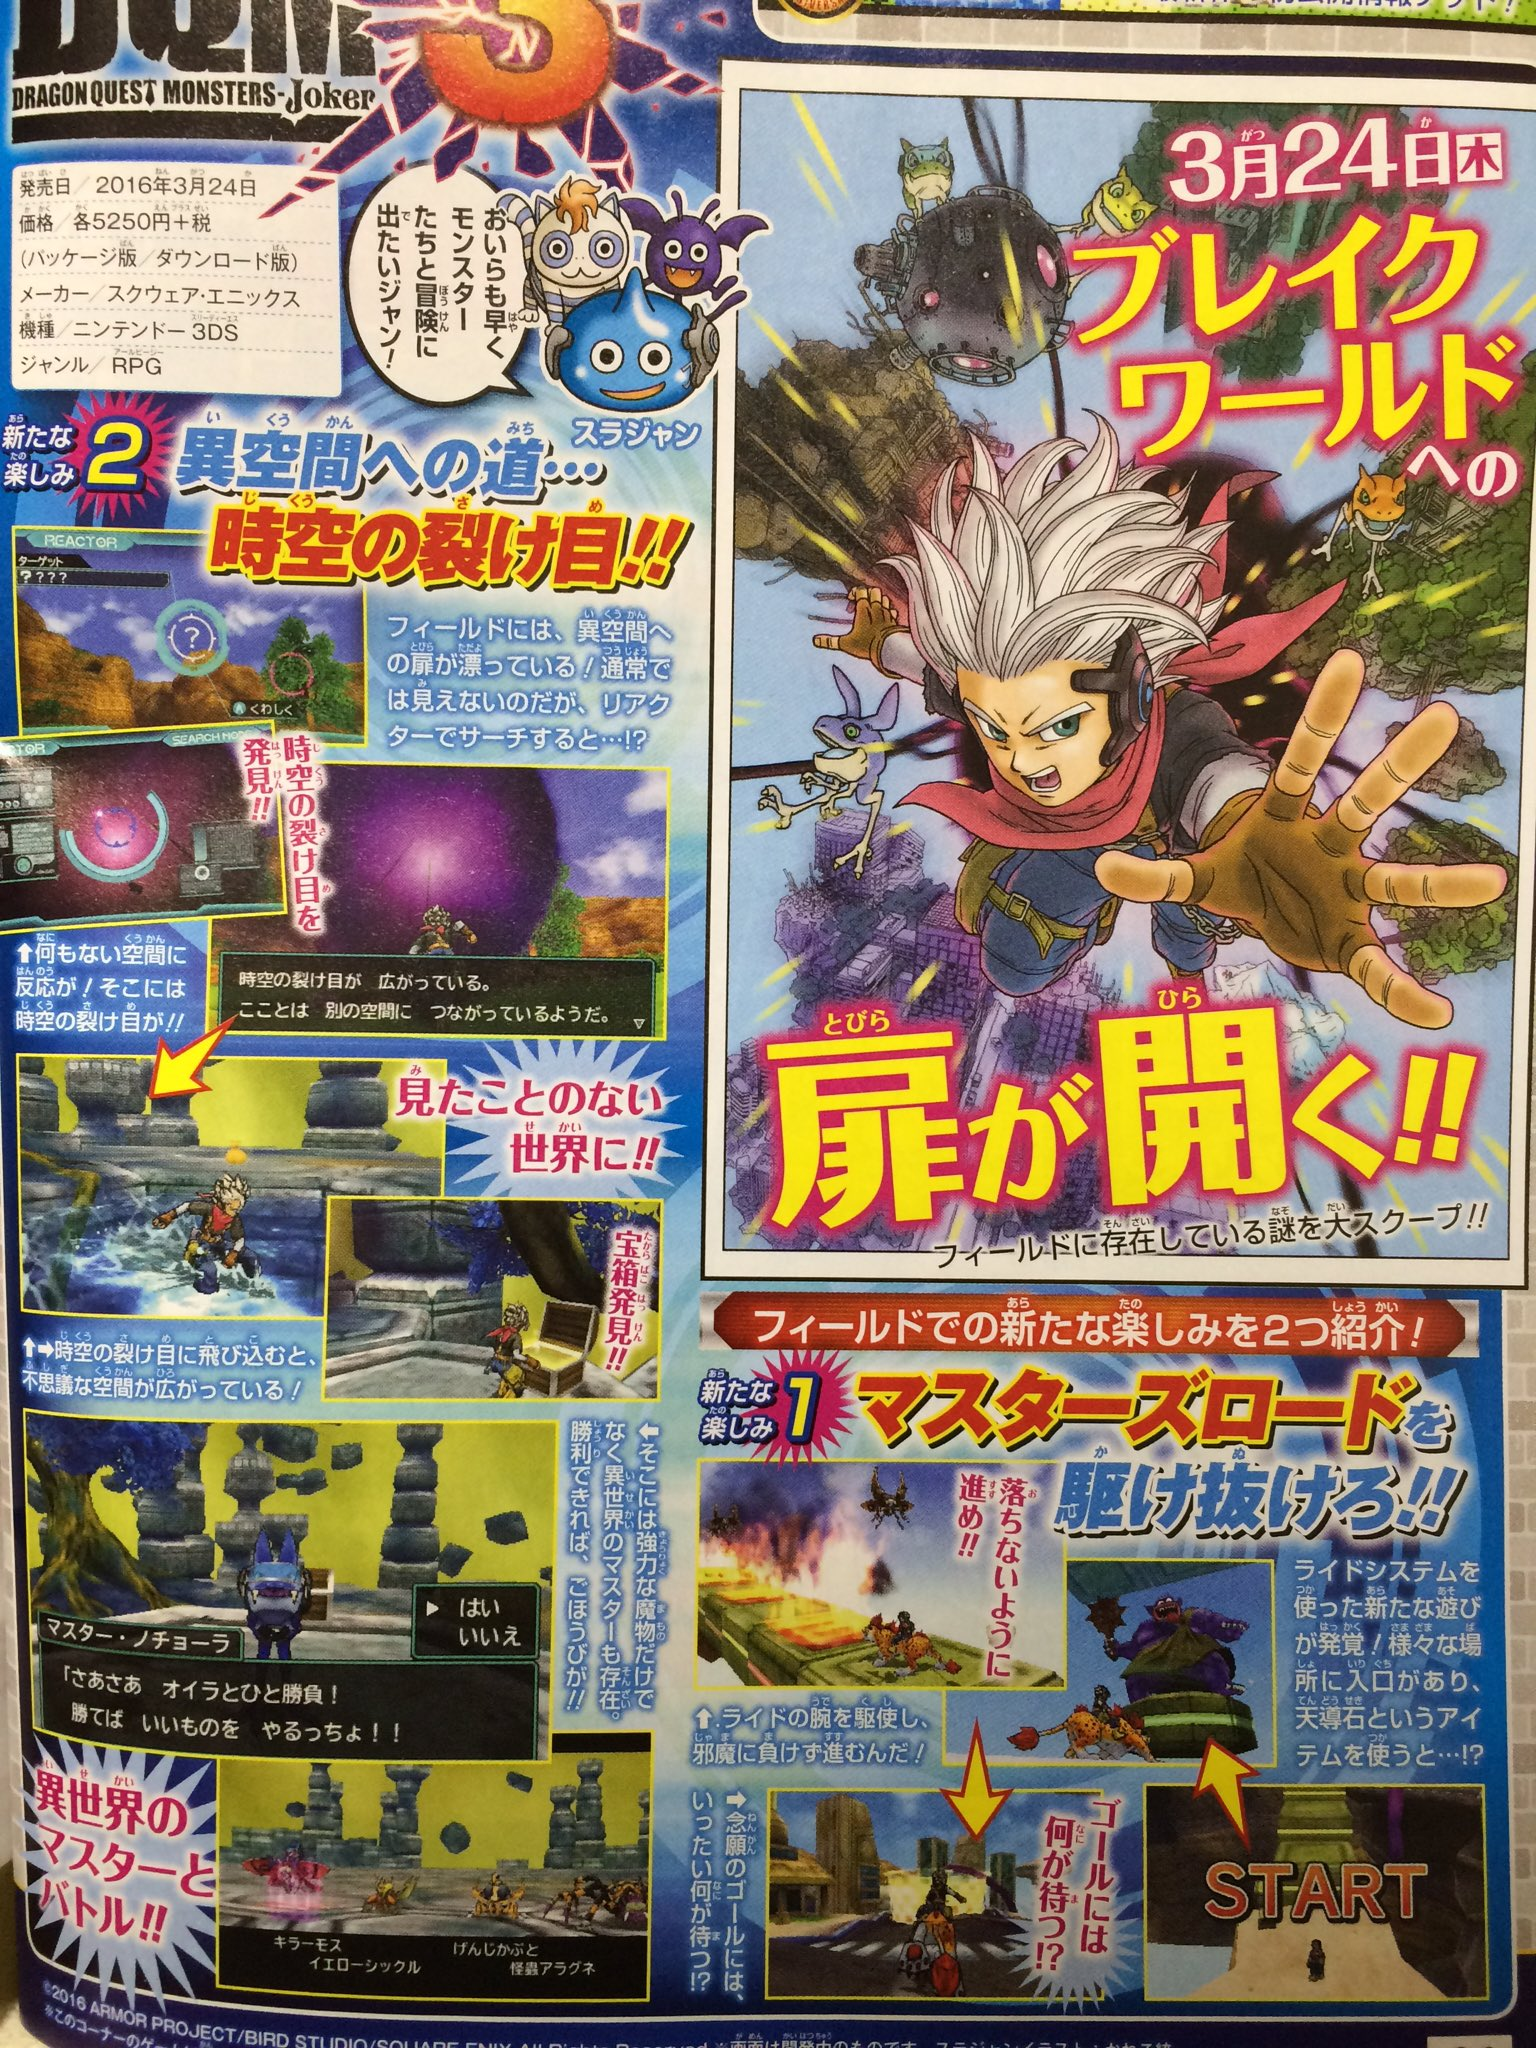 Dragon Quest Monsters: Joker 3 - Master's Road details, new scan